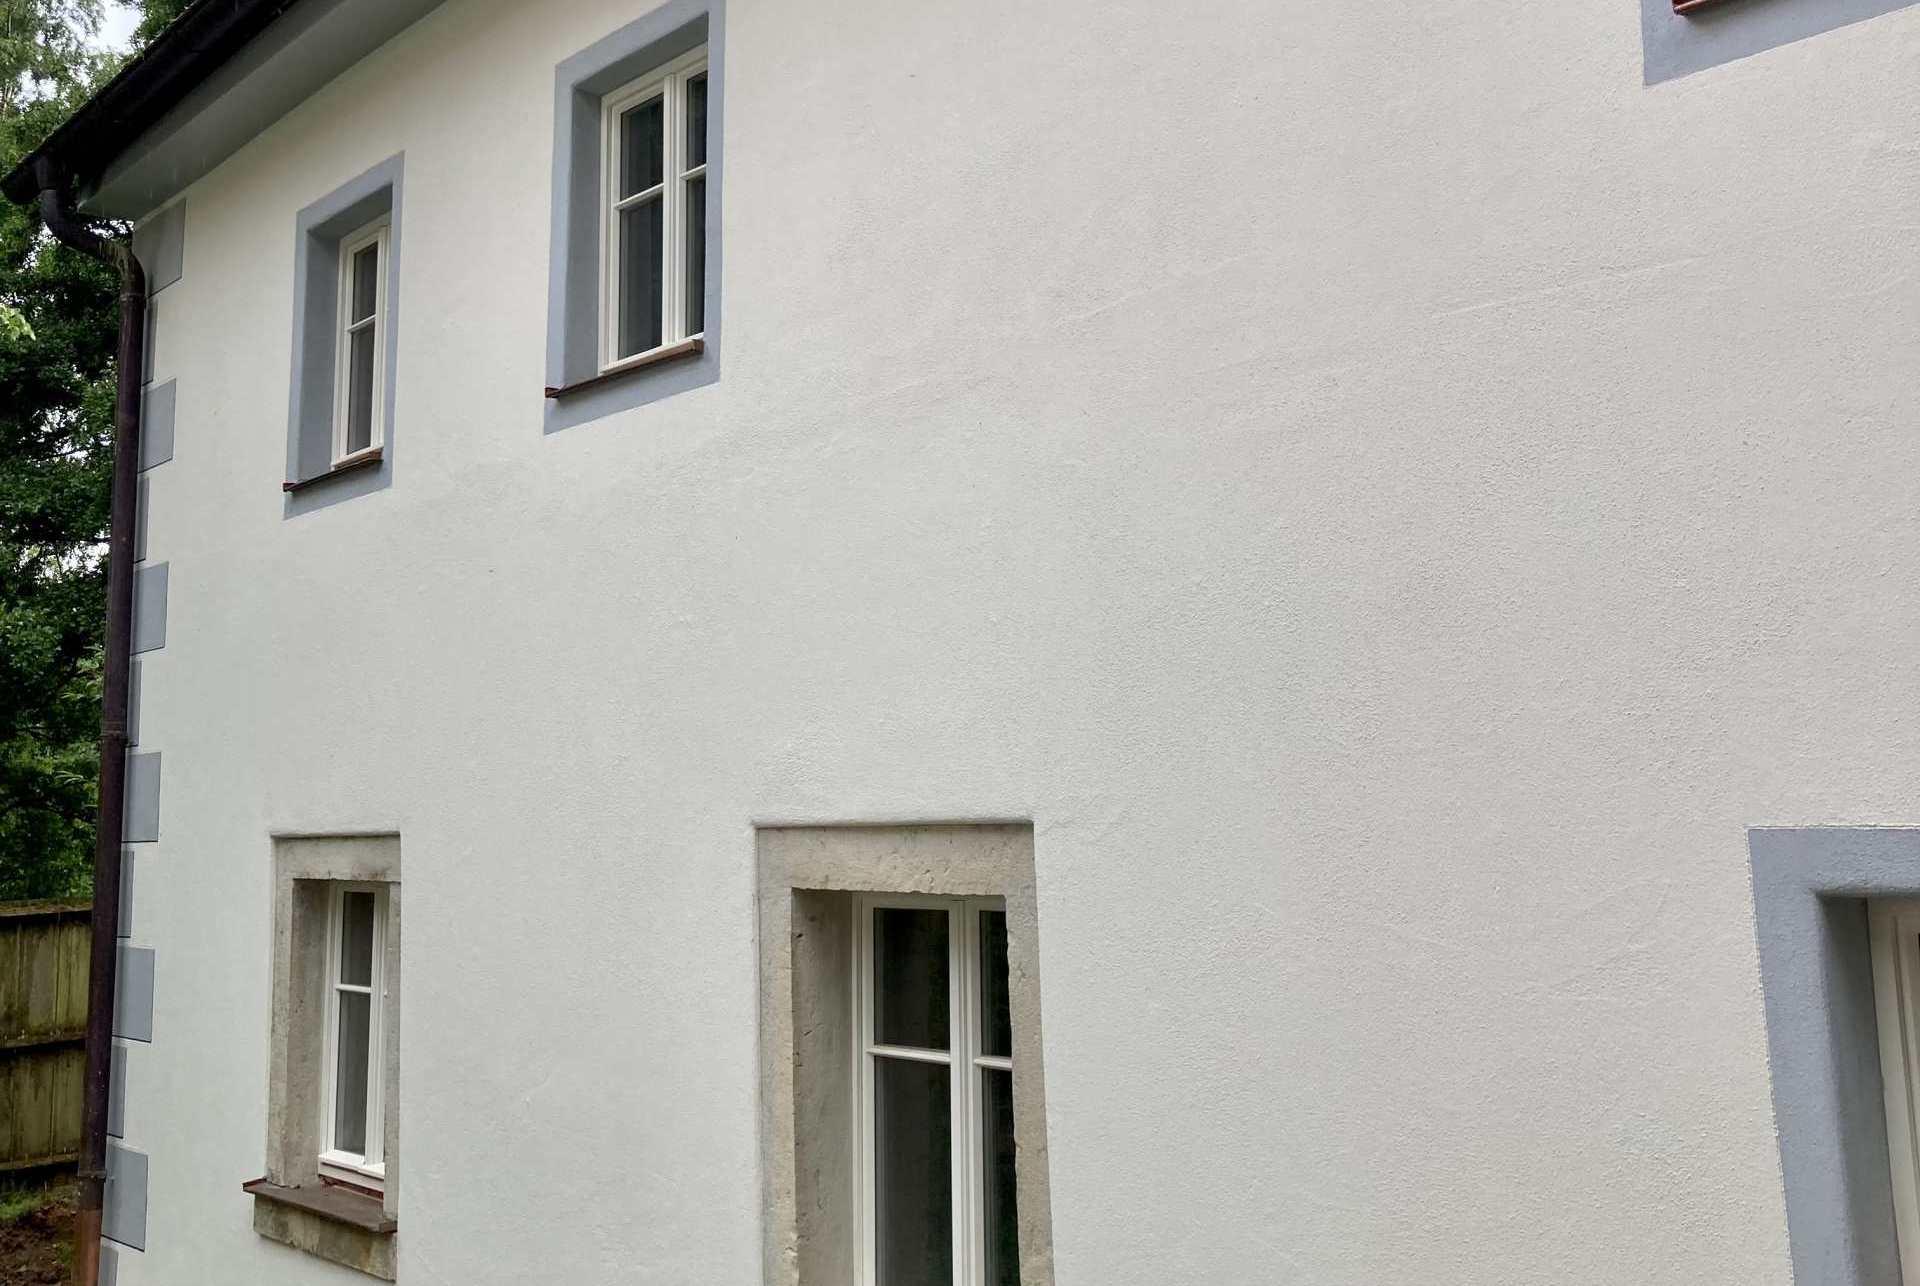 Holzfenster Nennslingen